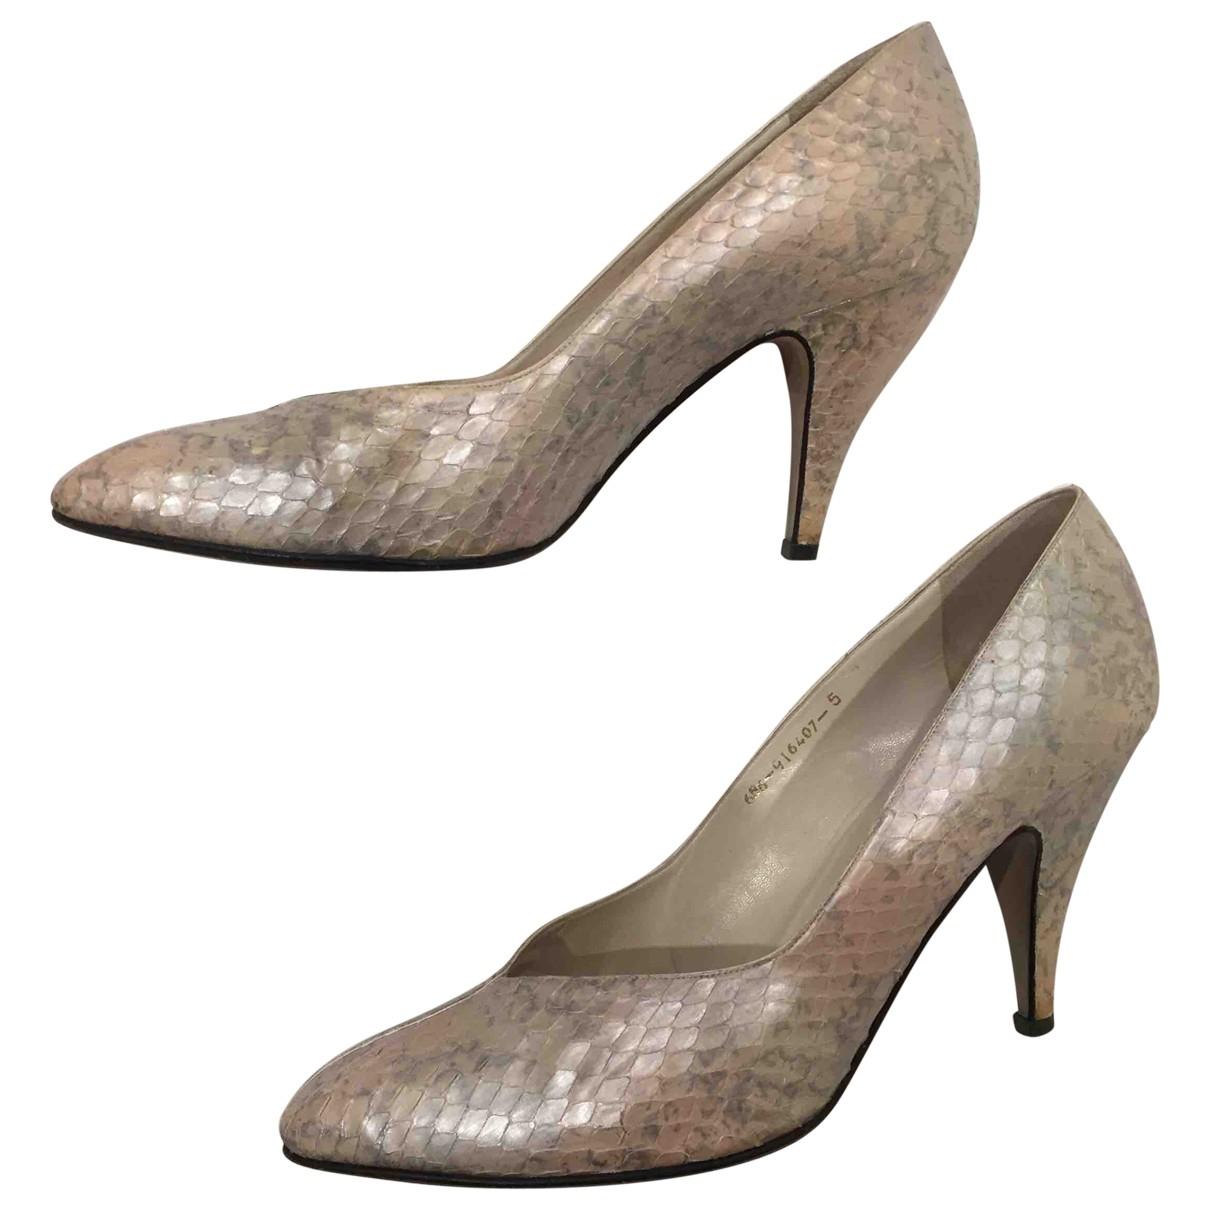 Gina \N Metallic Leather Heels for Women 38 EU